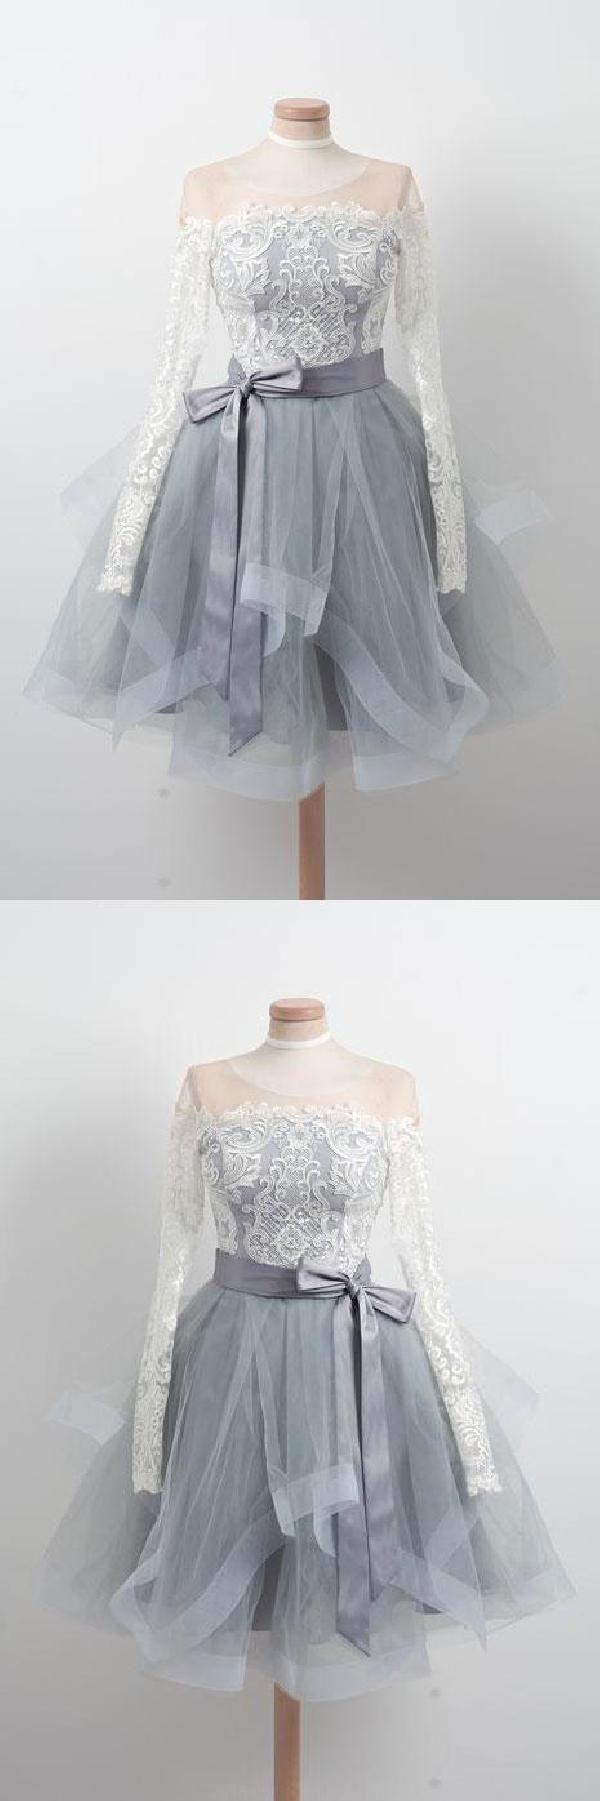 Short prom dresses prom dresses lace dress dress